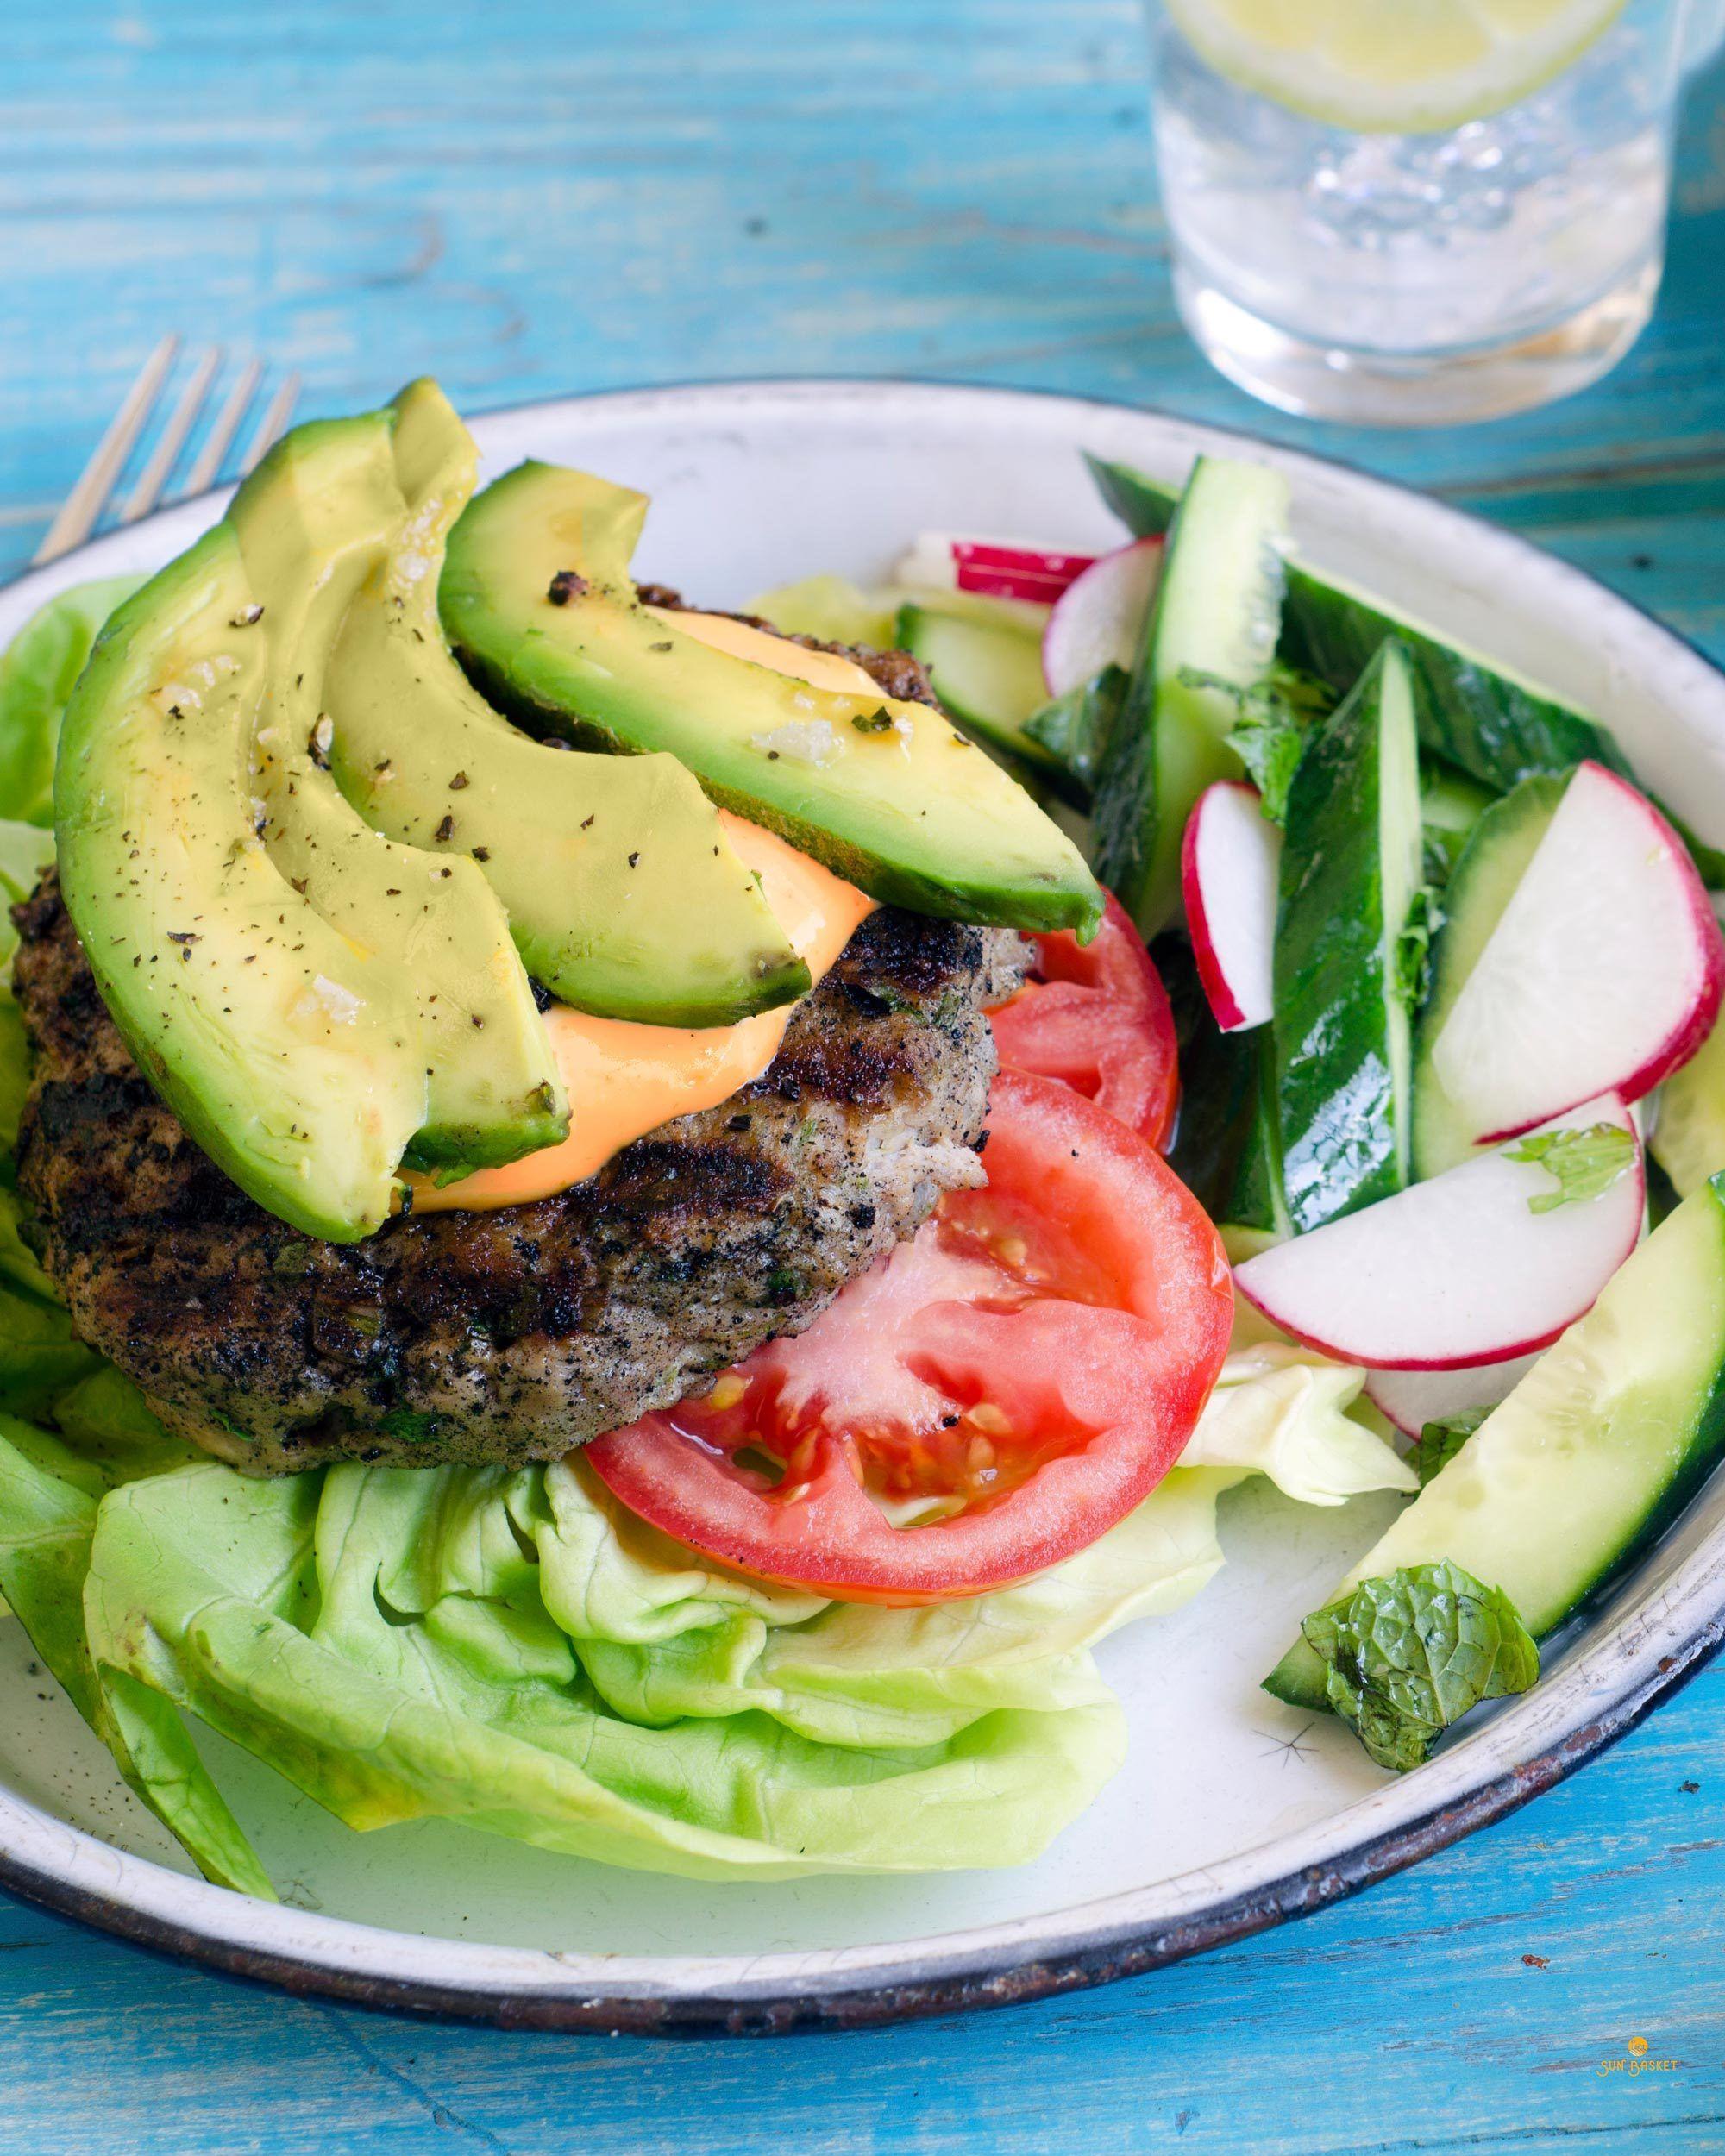 Lettuce Wrapped Turkey Burgers With Avocado And Sambal Mayo